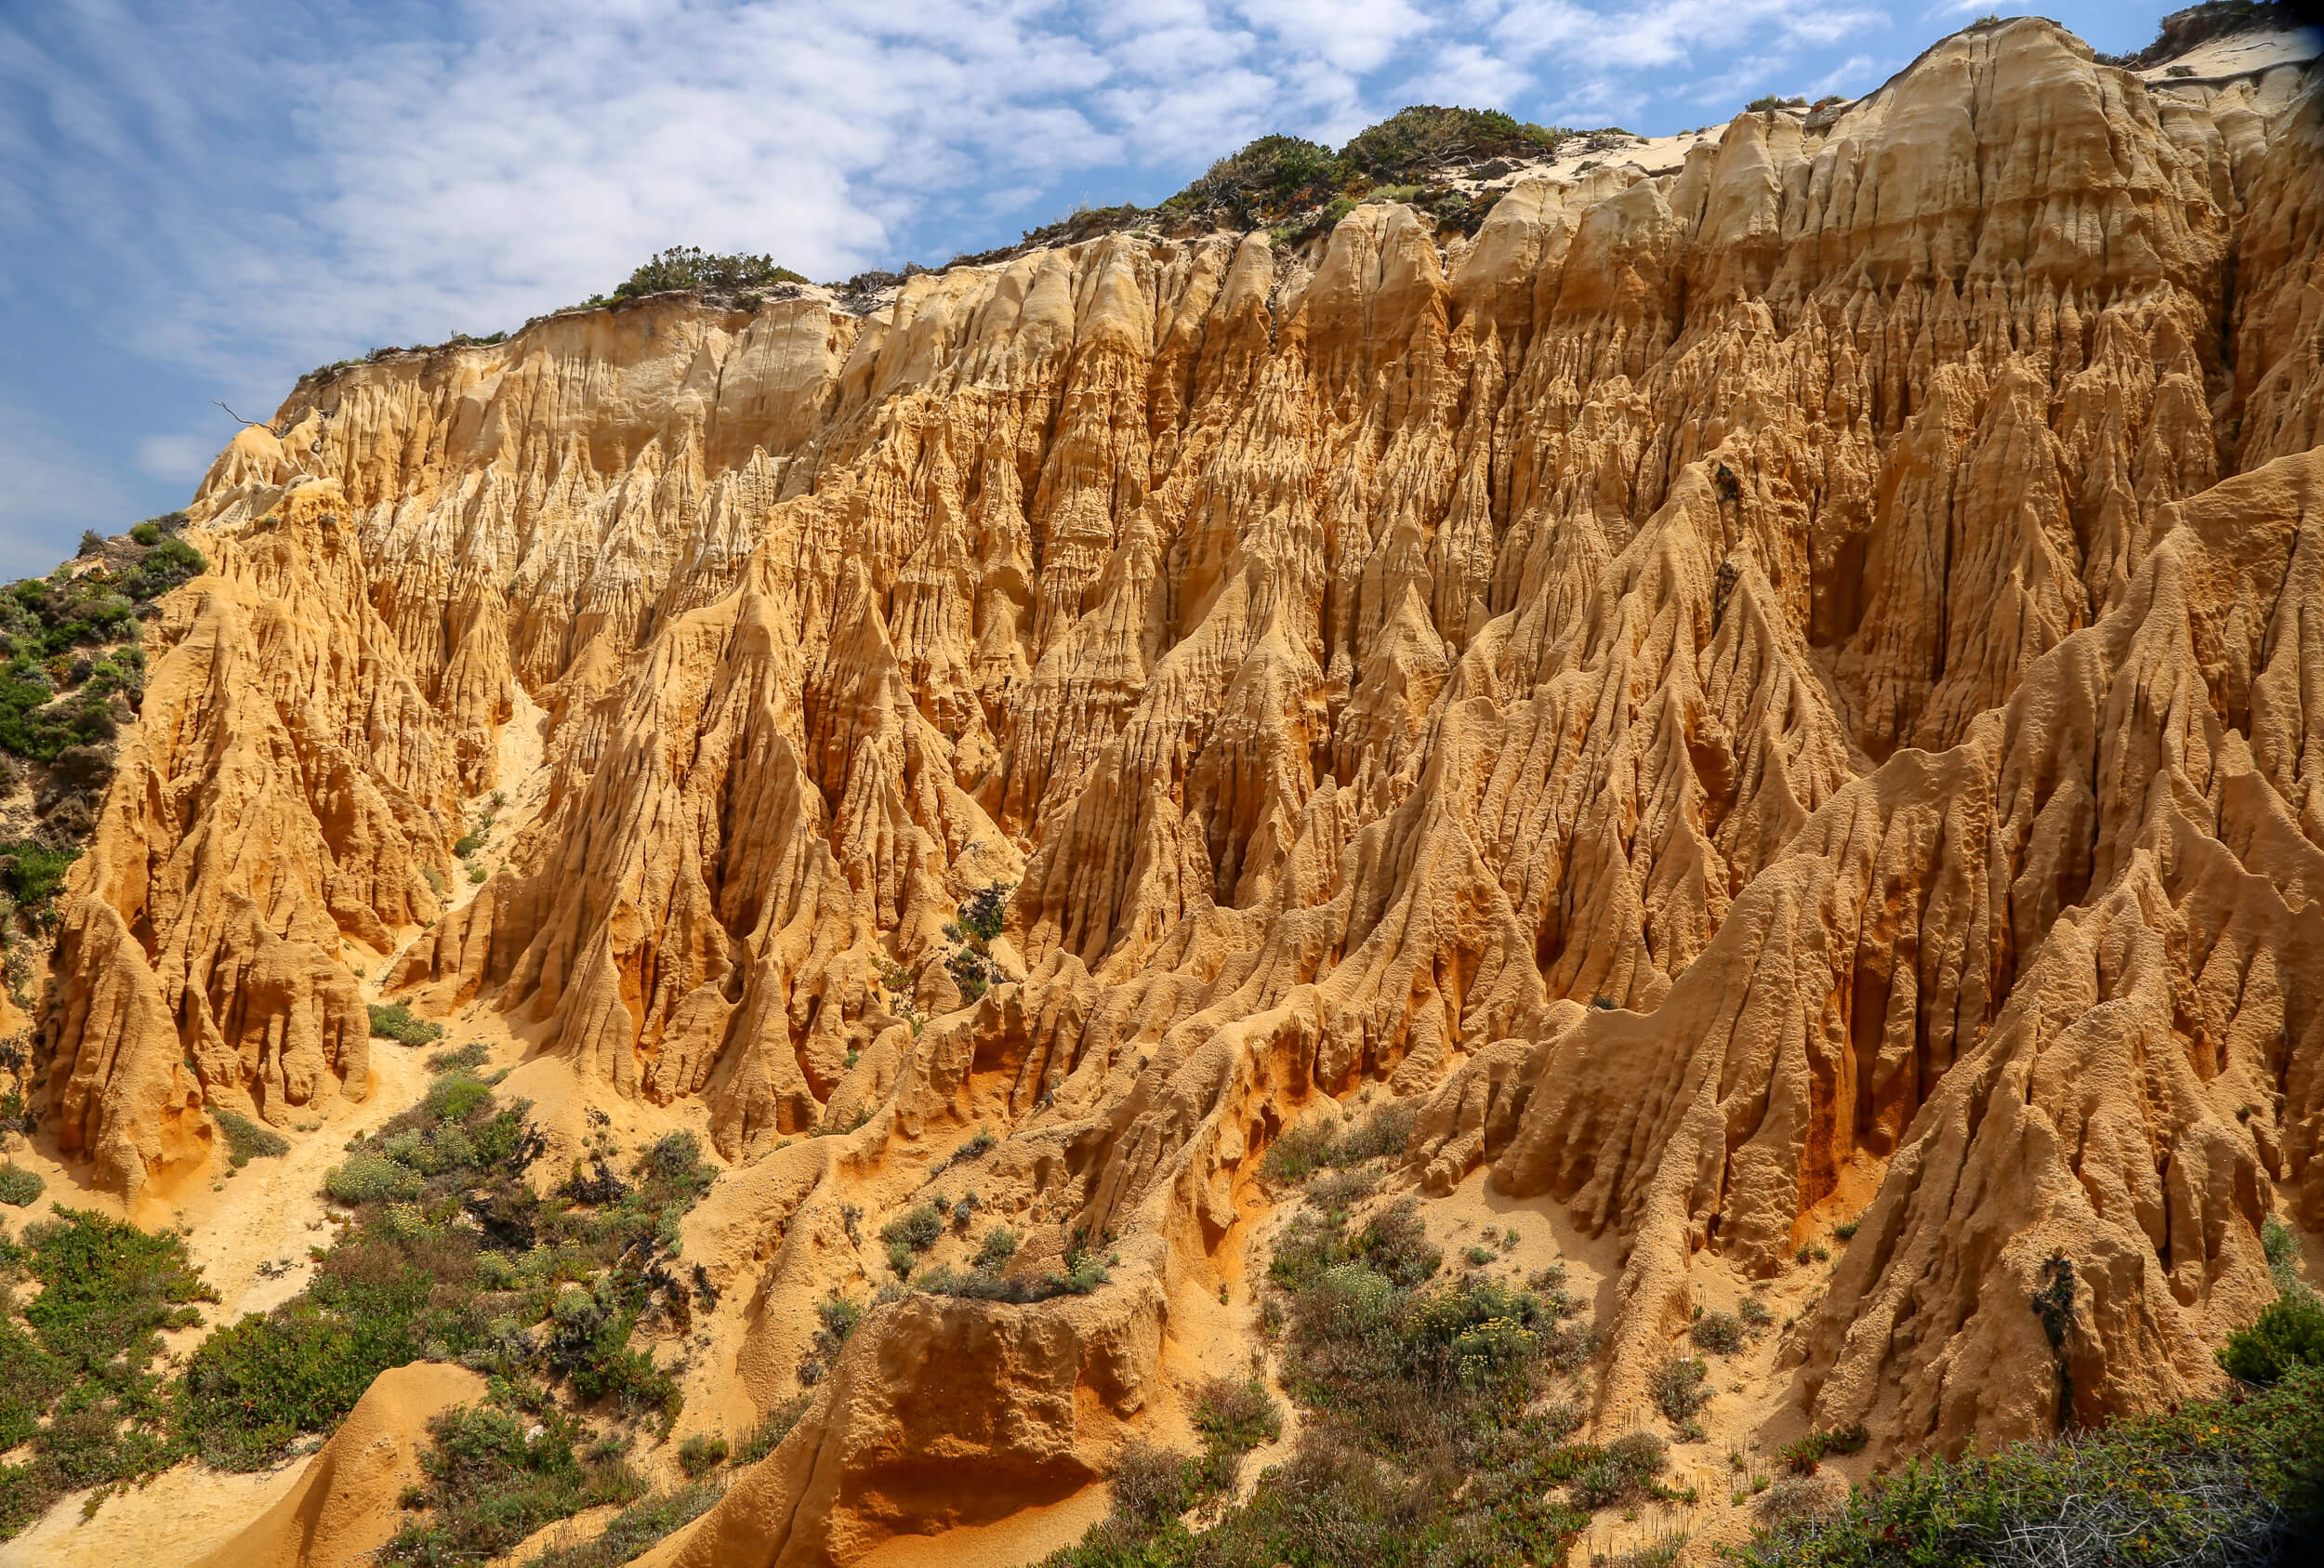 Fossil da Galé formation